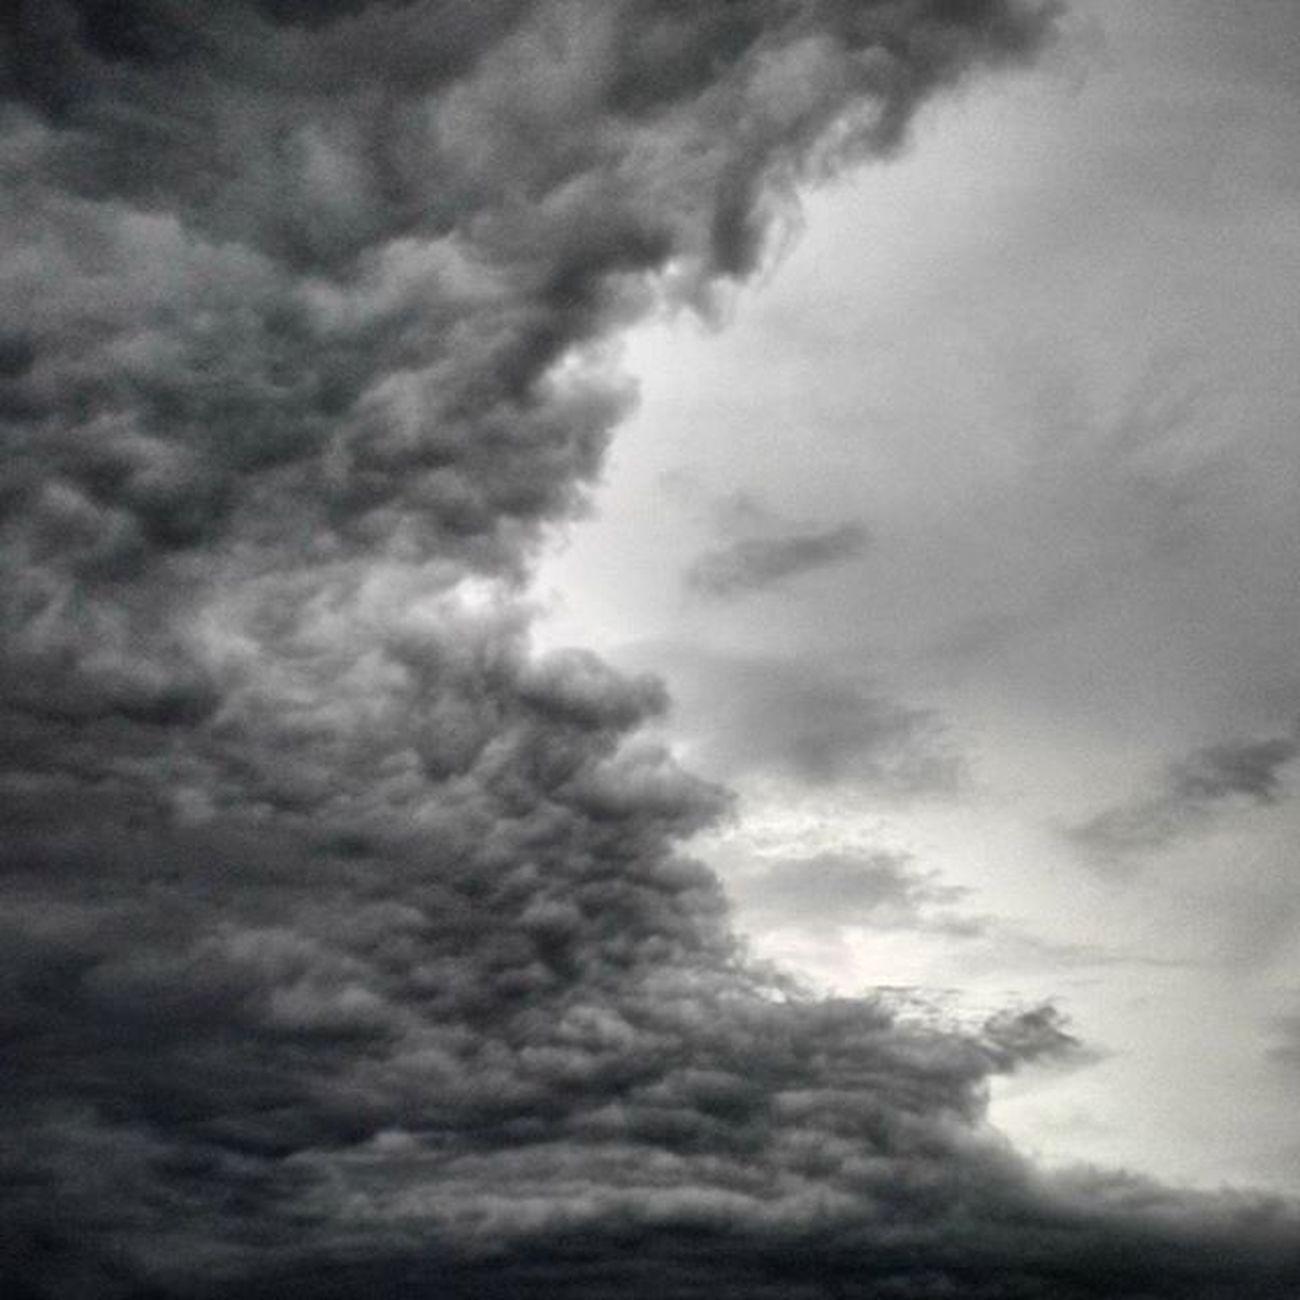 Над зелёной равниной дачной ветер тучи собирает. омск сибирь сибирскоелето небомореоблака тучиходятхмуро тучи Omsk Siberiansummer Siberia Skyseaclouds Overcast